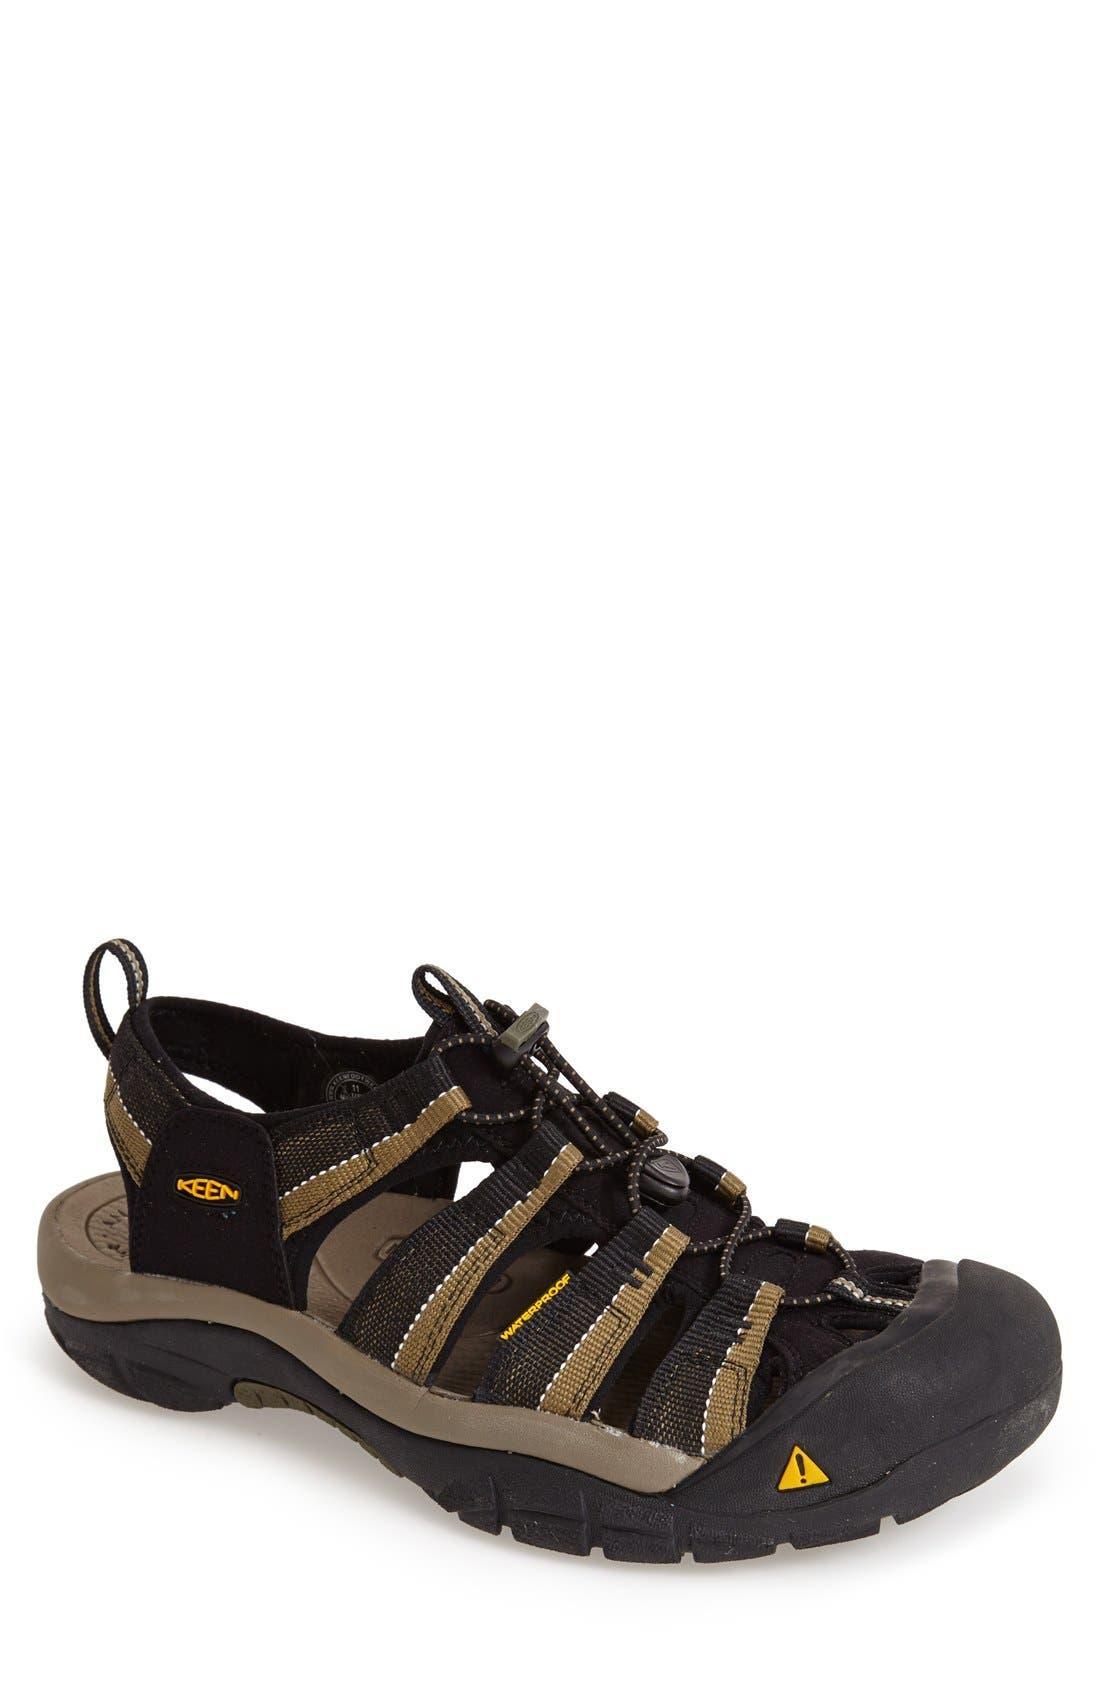 'Newport H2' Sandal,                         Main,                         color, BLACK/ STONE GREY